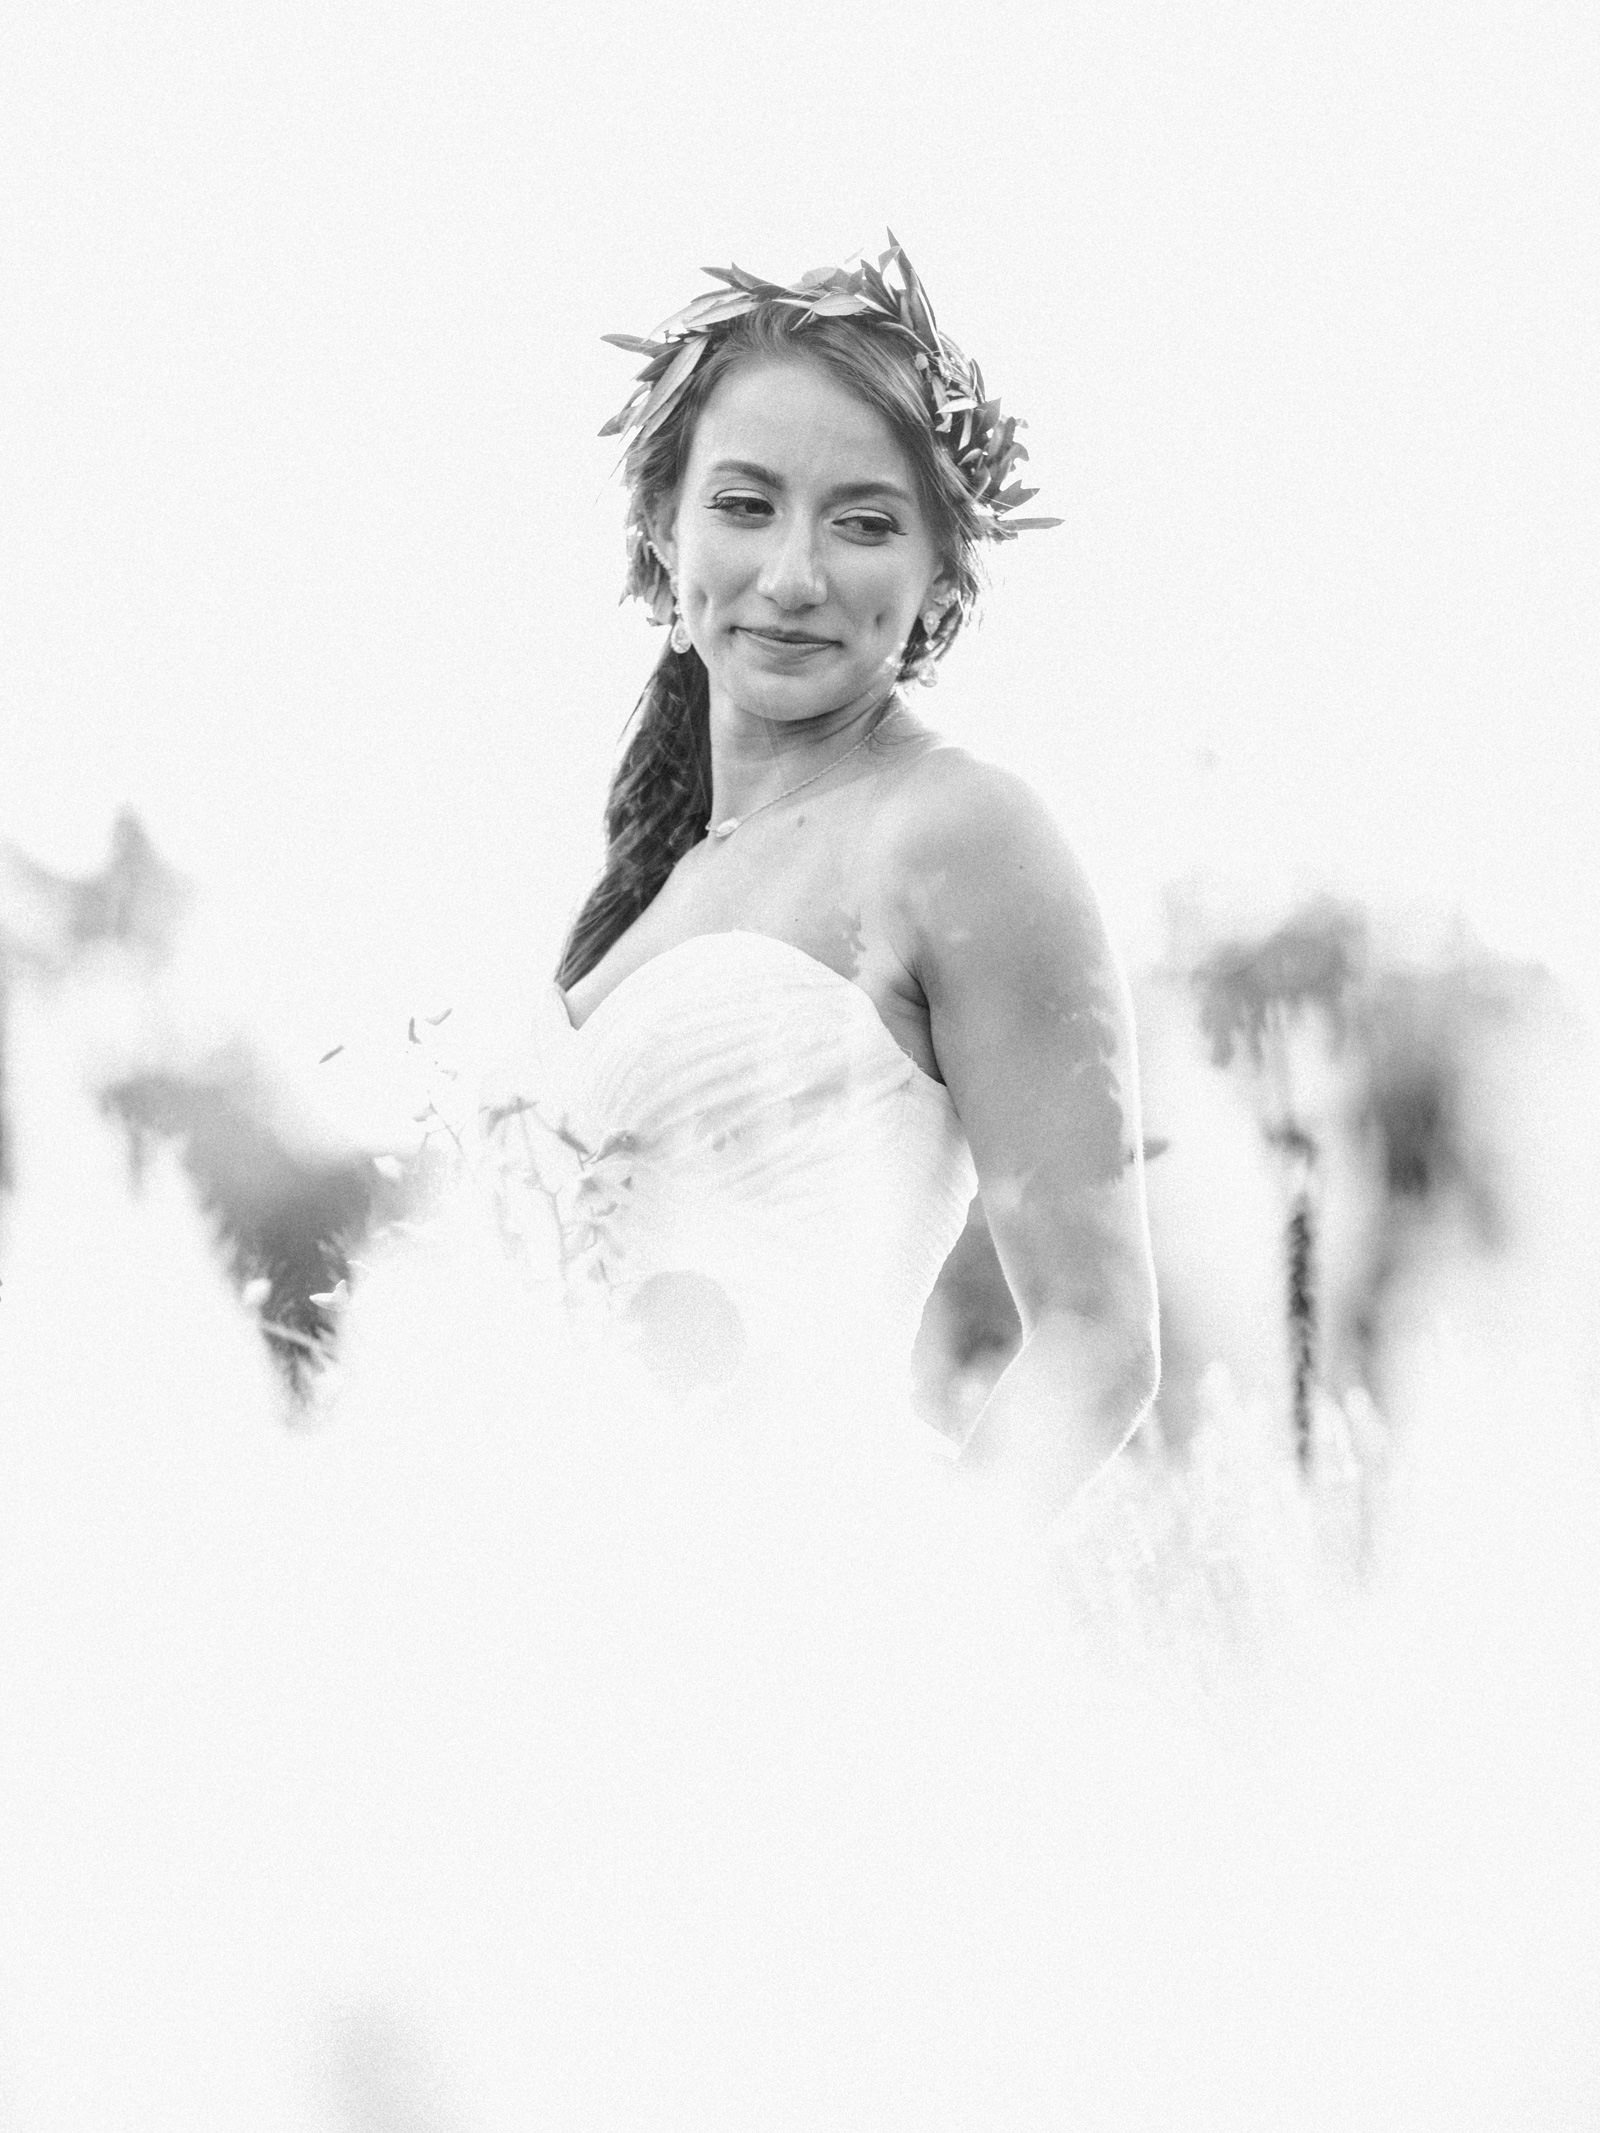 096-woodinville-lavendar-farm-wedding-with-golden-glowy-photos.jpg